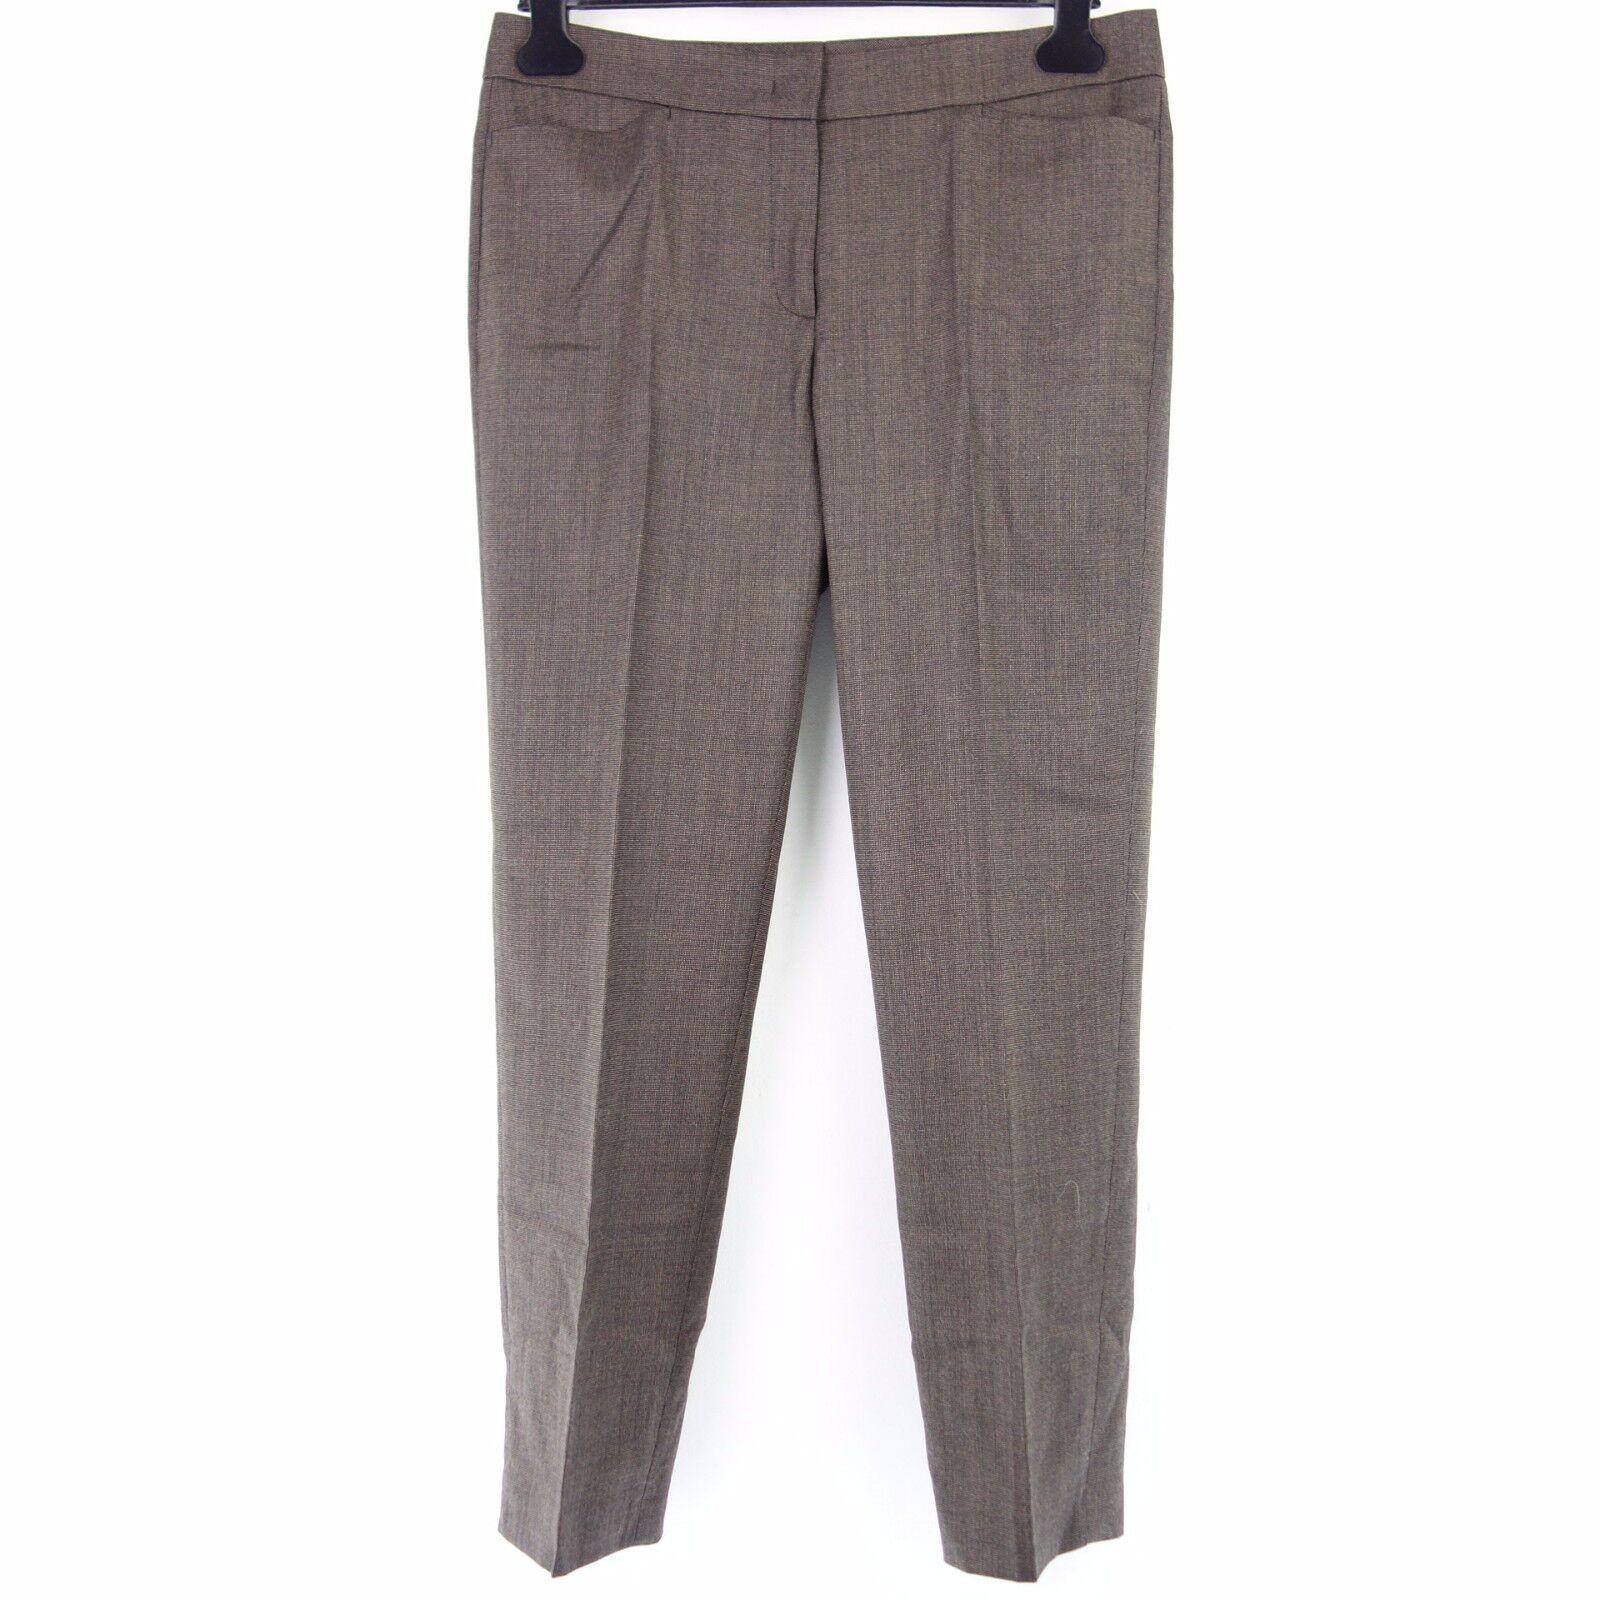 Raffaello Rossi Women Pants Pauline Size 40 Brown Wool Regular Fit Np 149